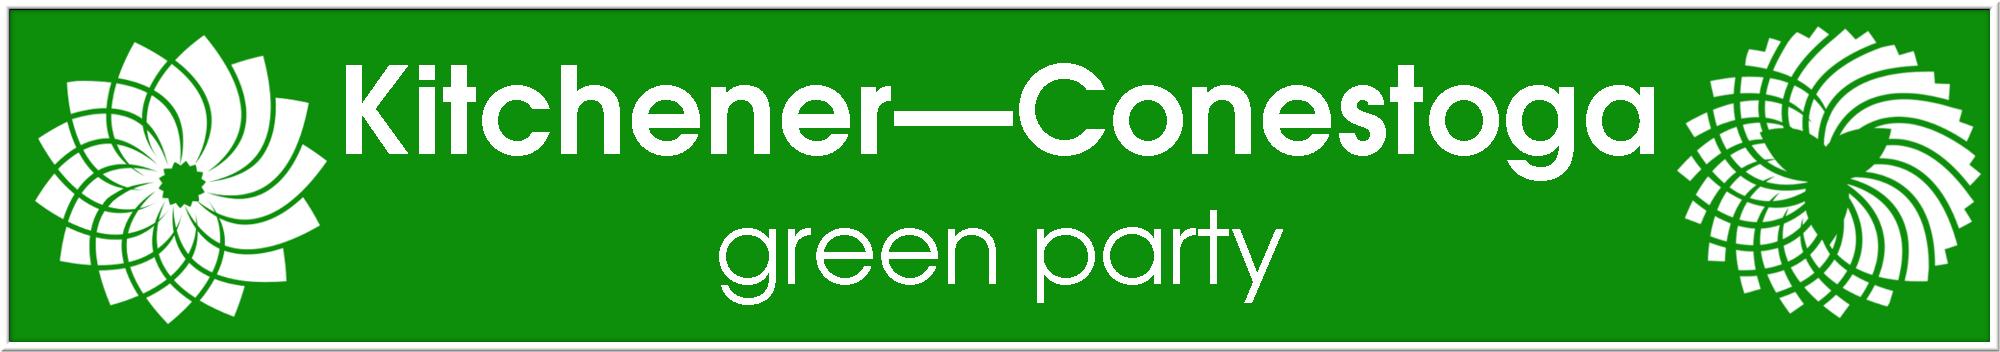 Kitchener-ConestogaGreenParty